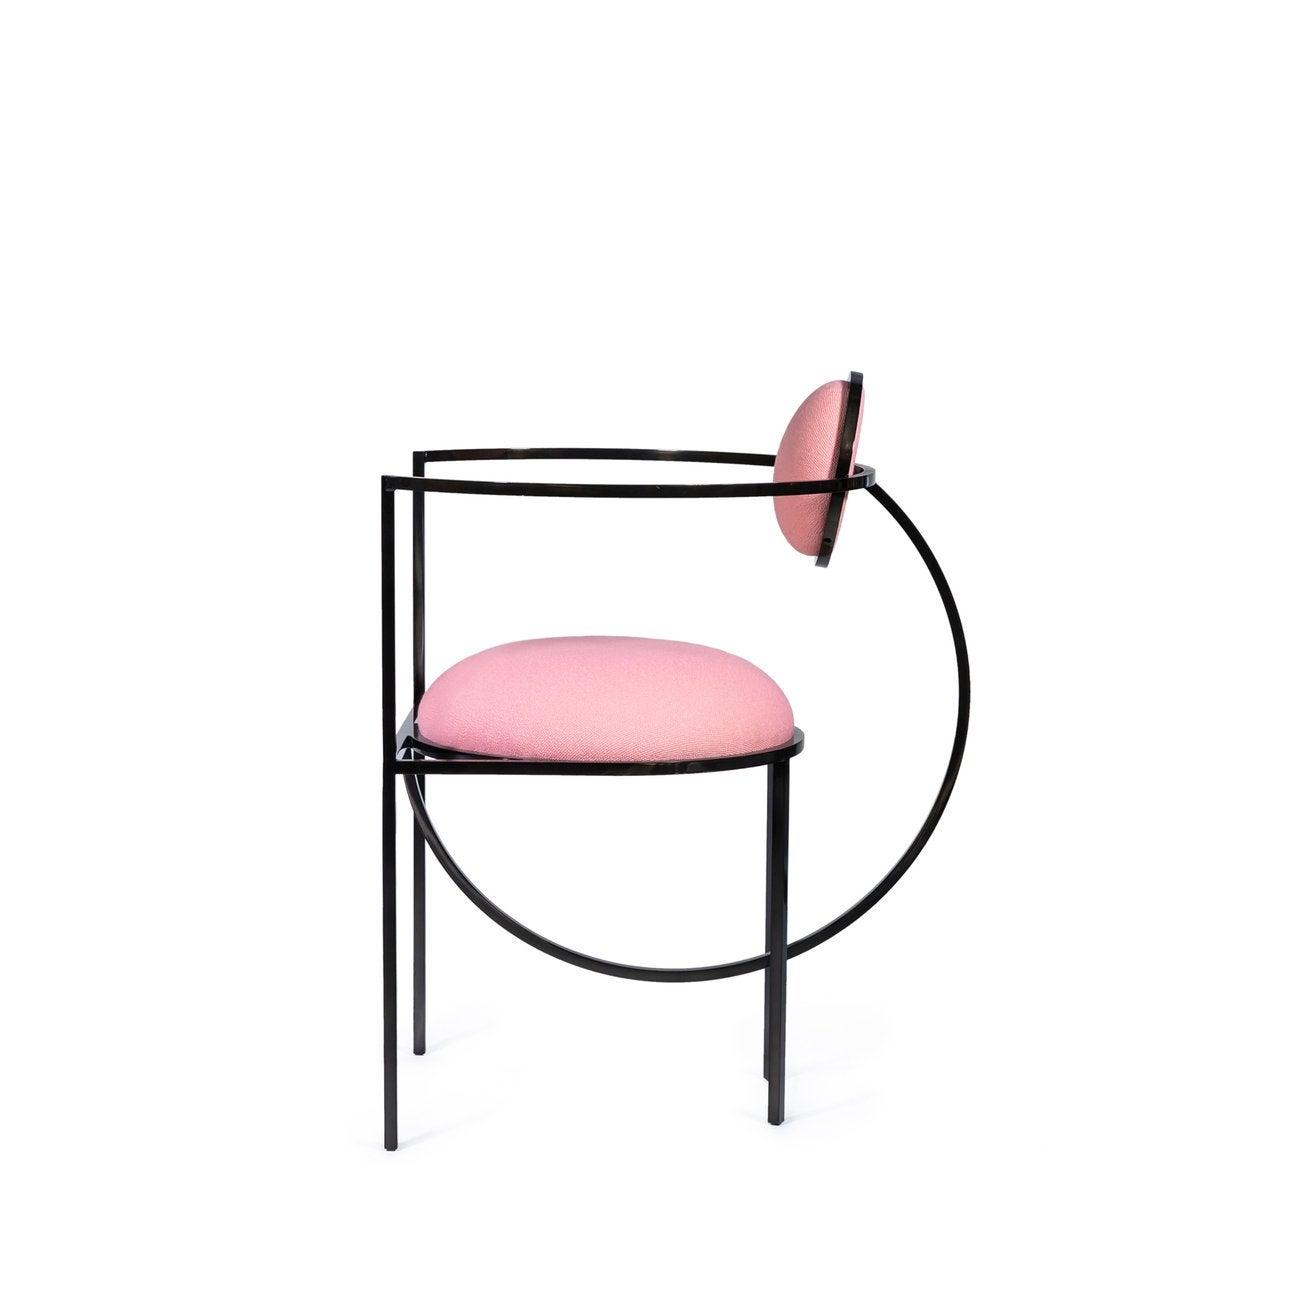 bohinc studio chair